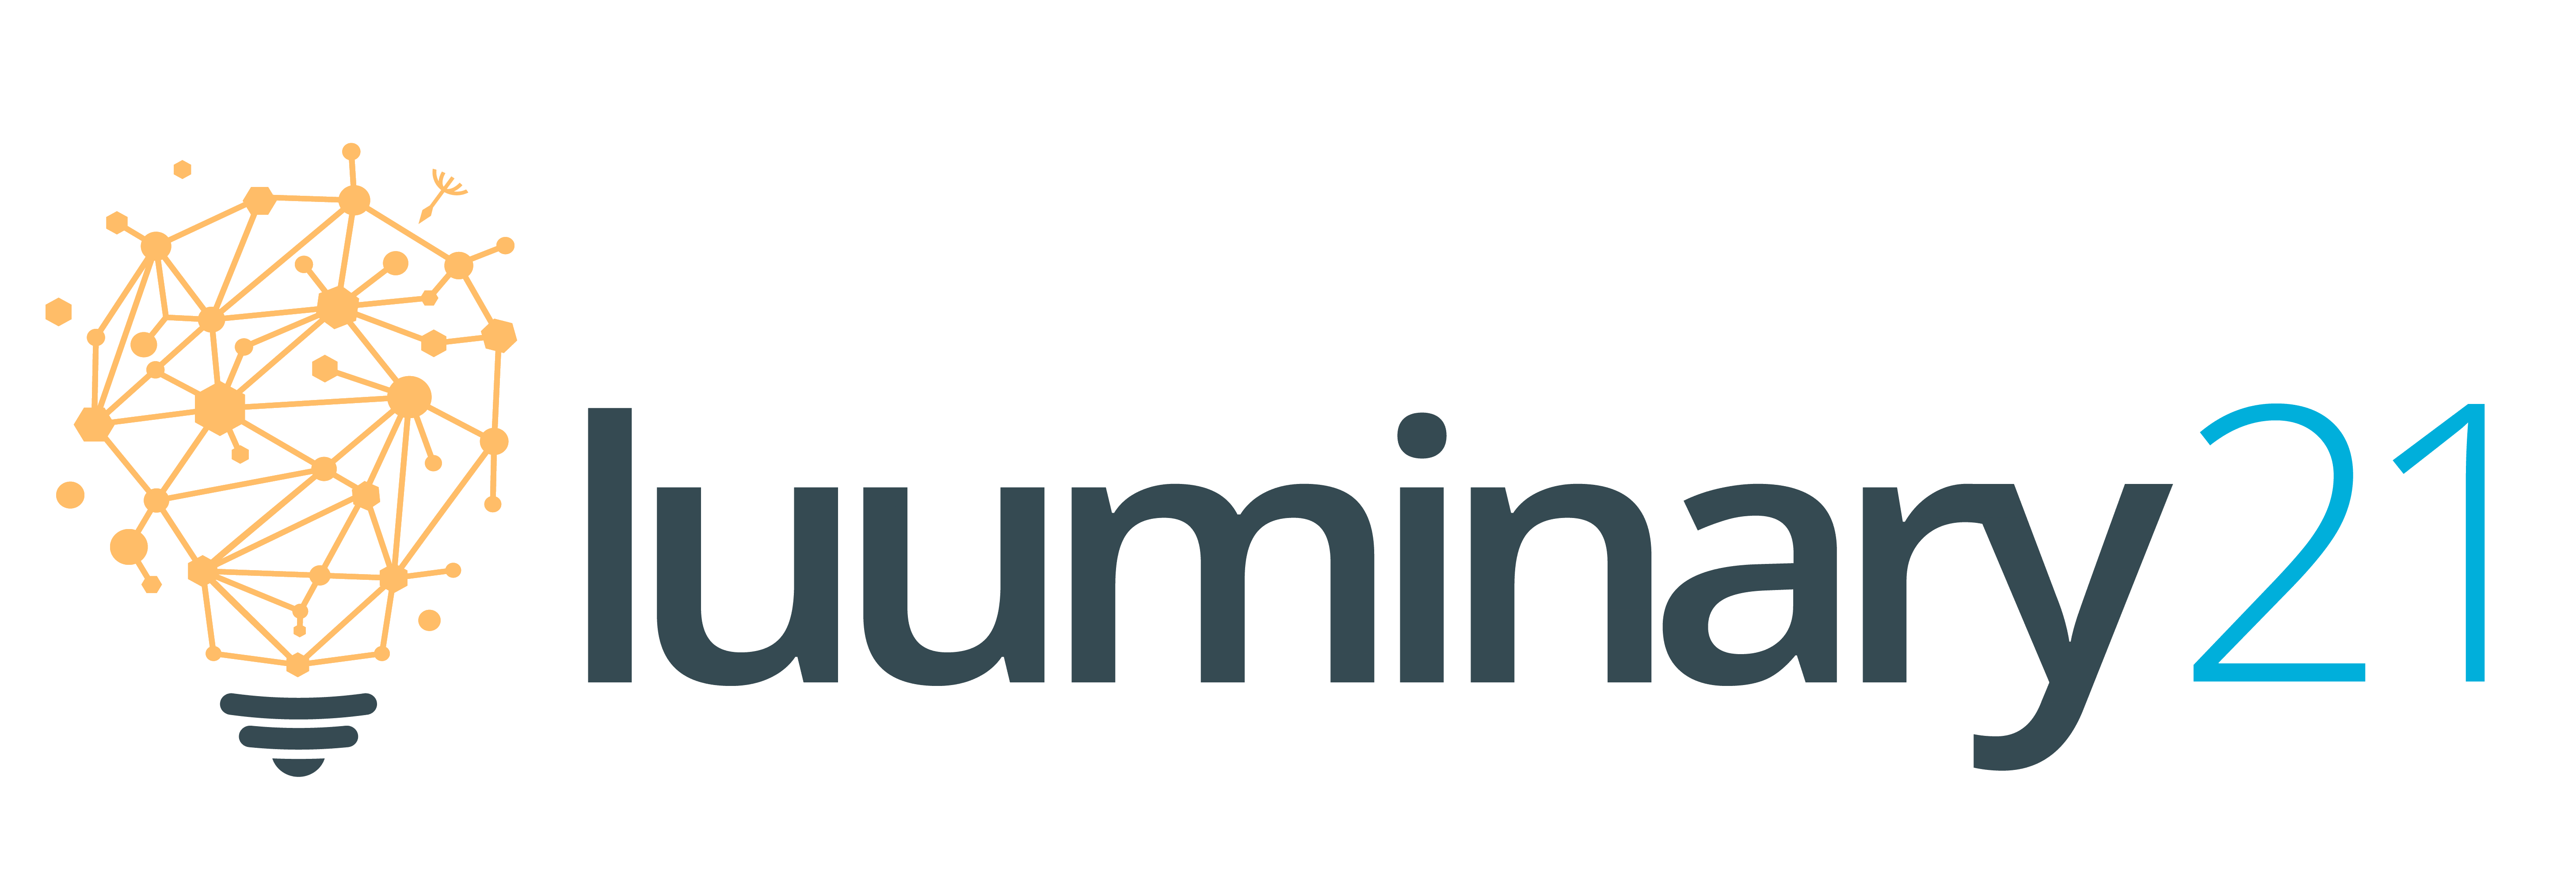 Luuminary21